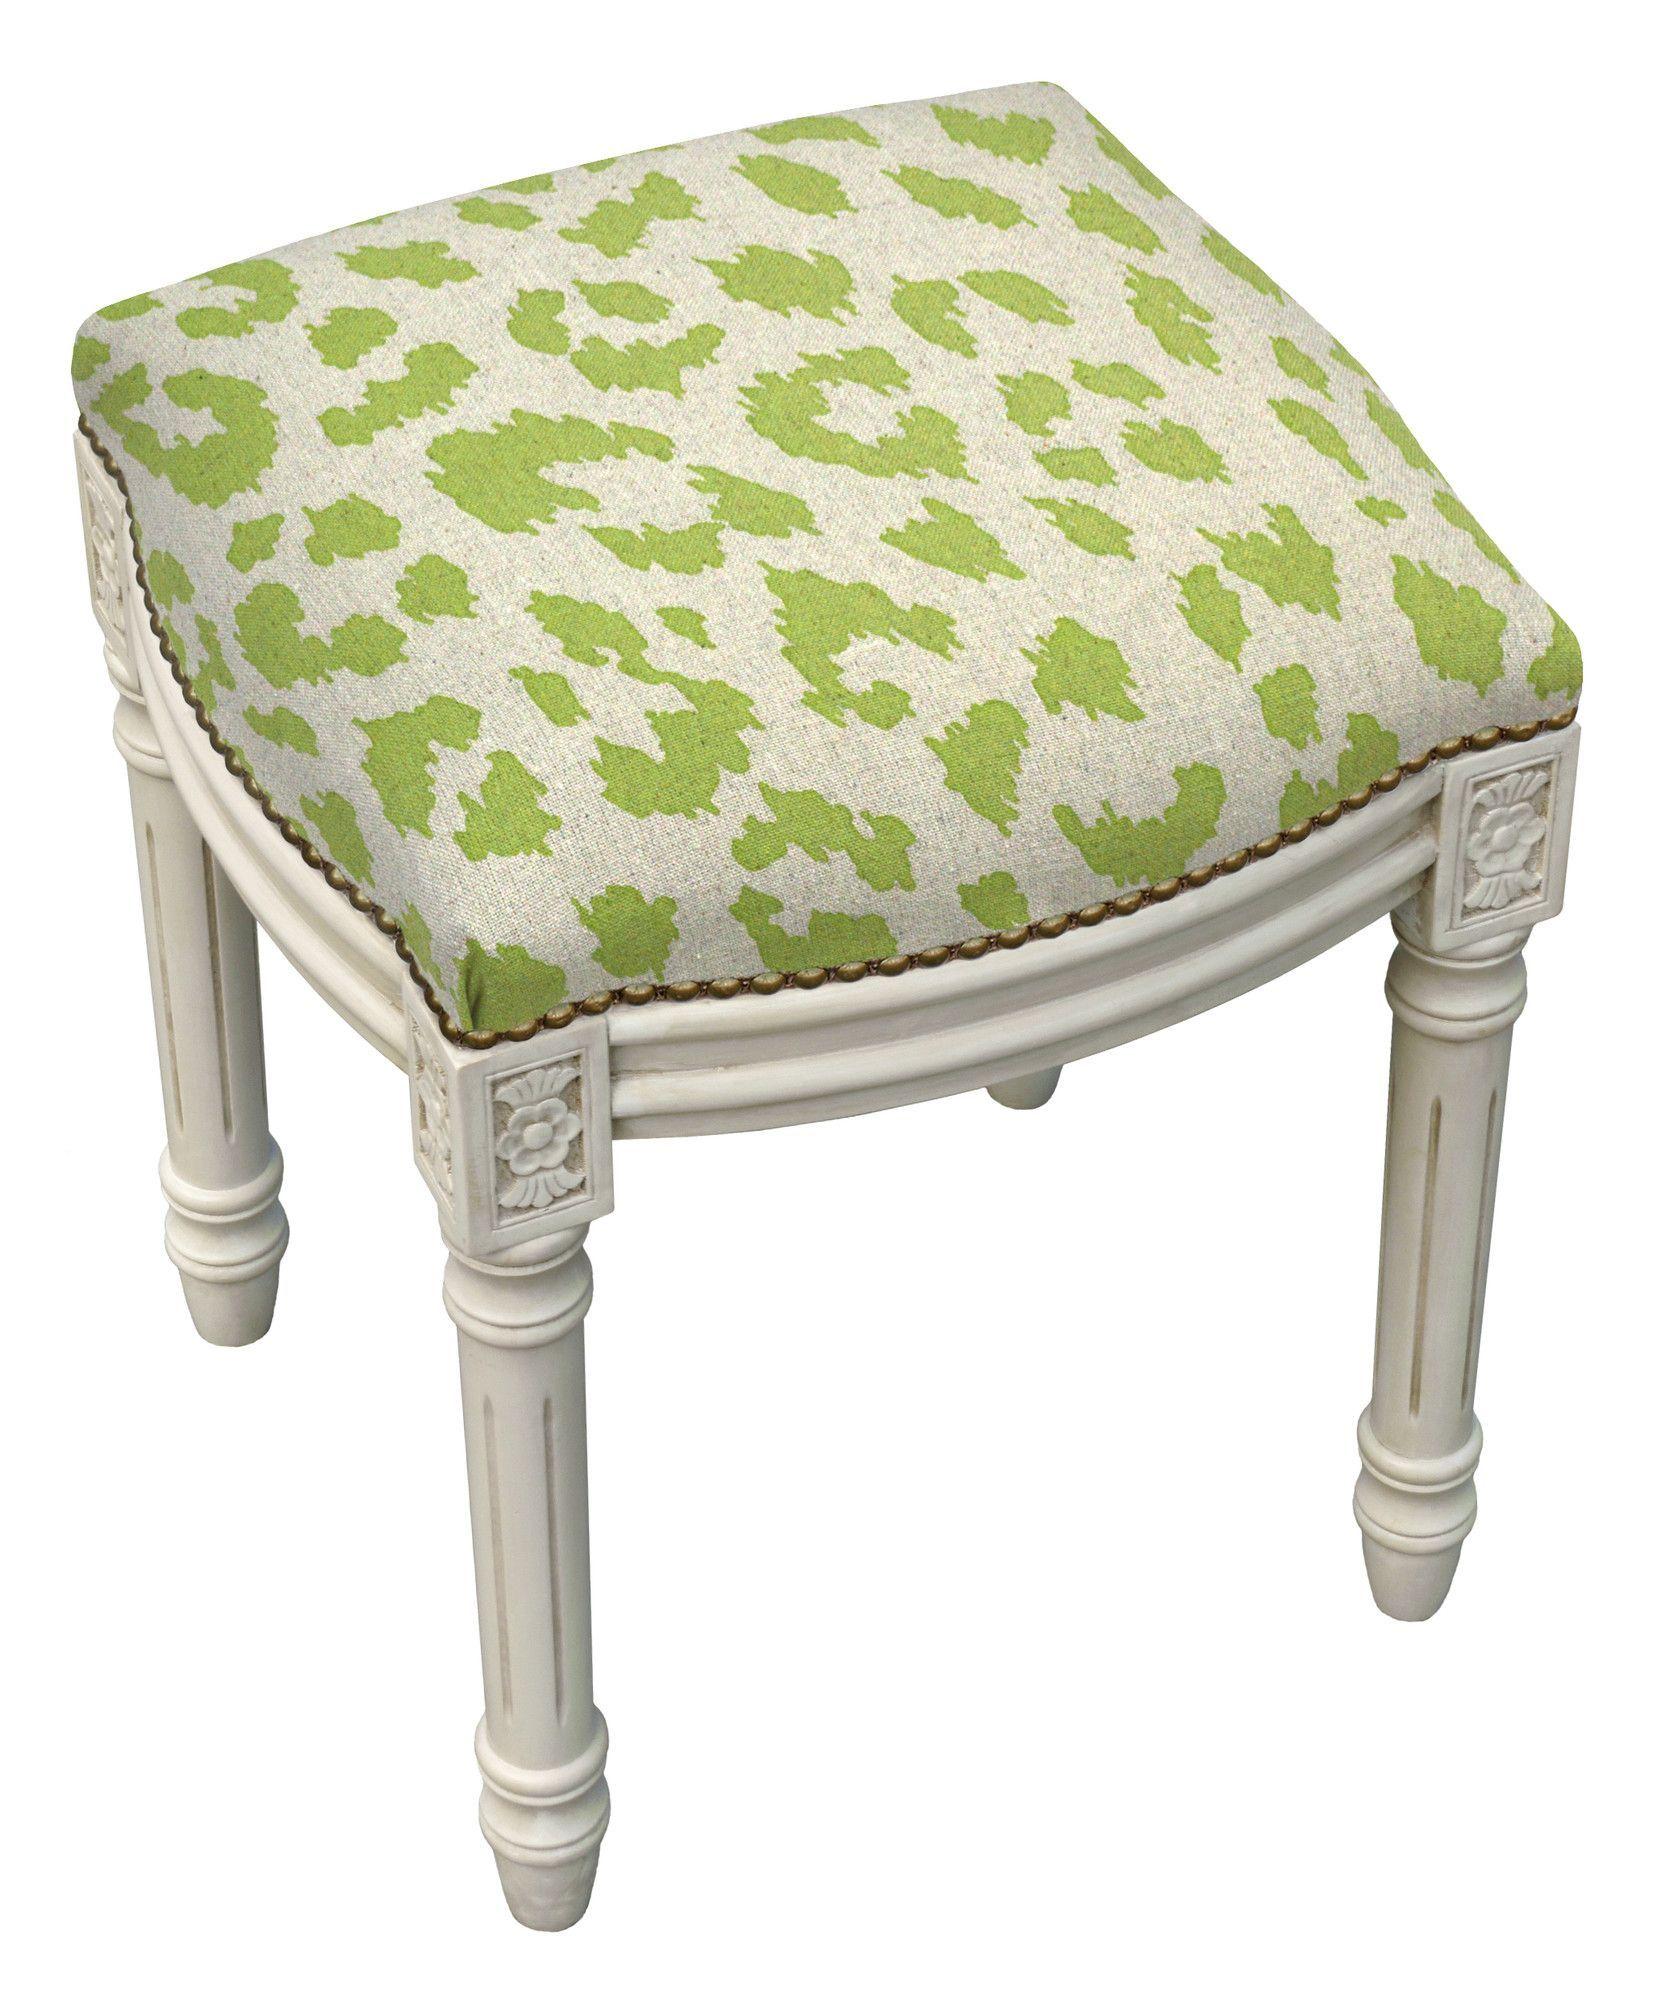 Excellent 123 Creations Animal Print Cheetah Linen Upholstered Vanity Ncnpc Chair Design For Home Ncnpcorg